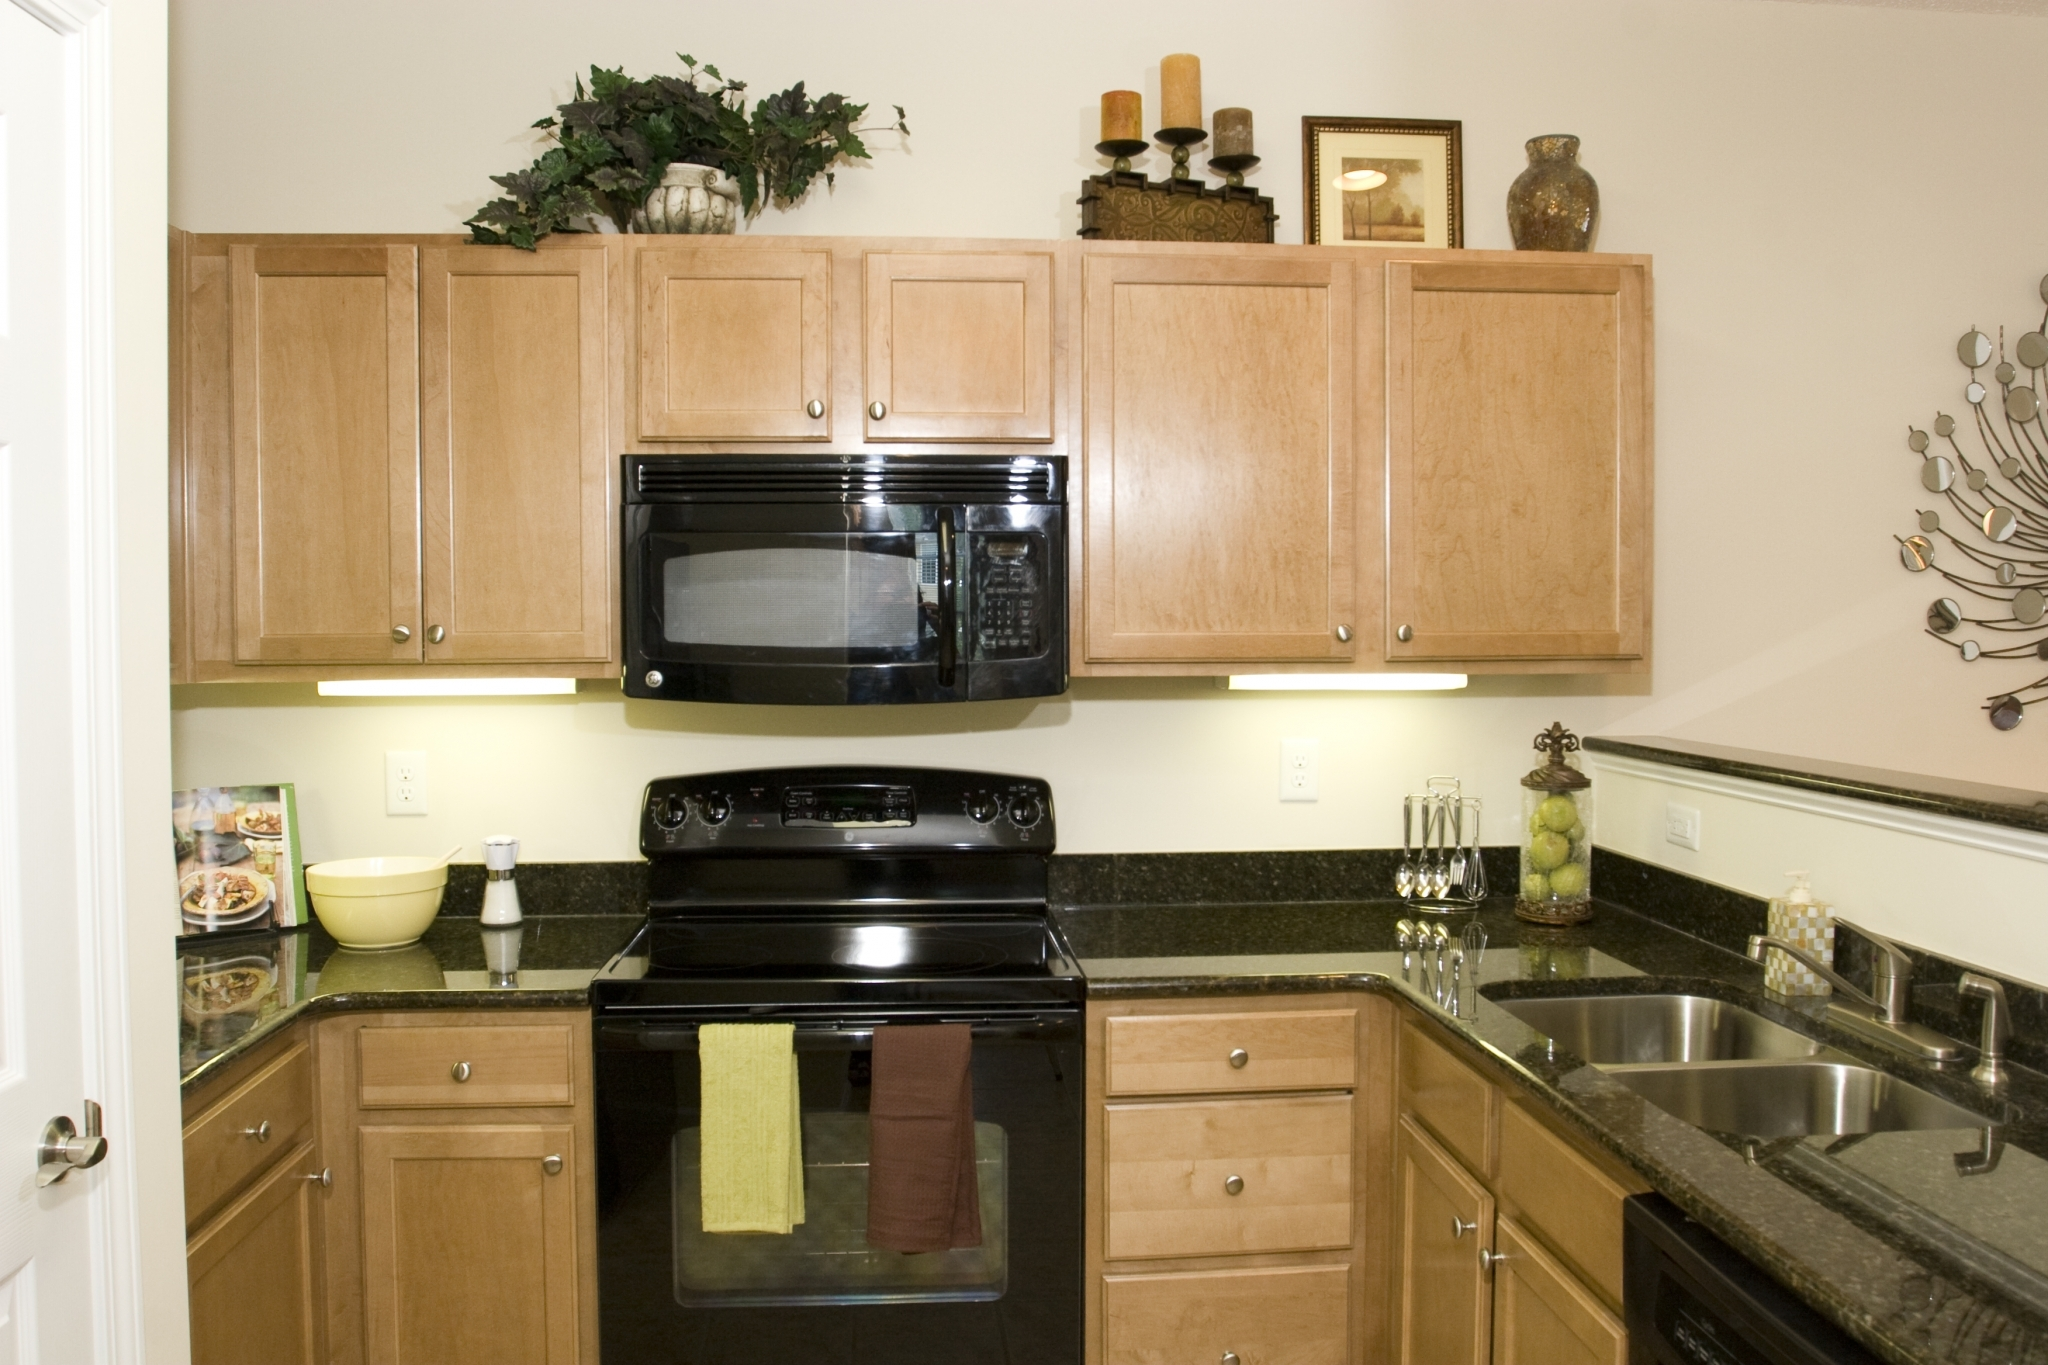 Uncategorized Kitchen Appliances Brighton ashley court 9740 lake ct charlotte nc 28262 ucribs